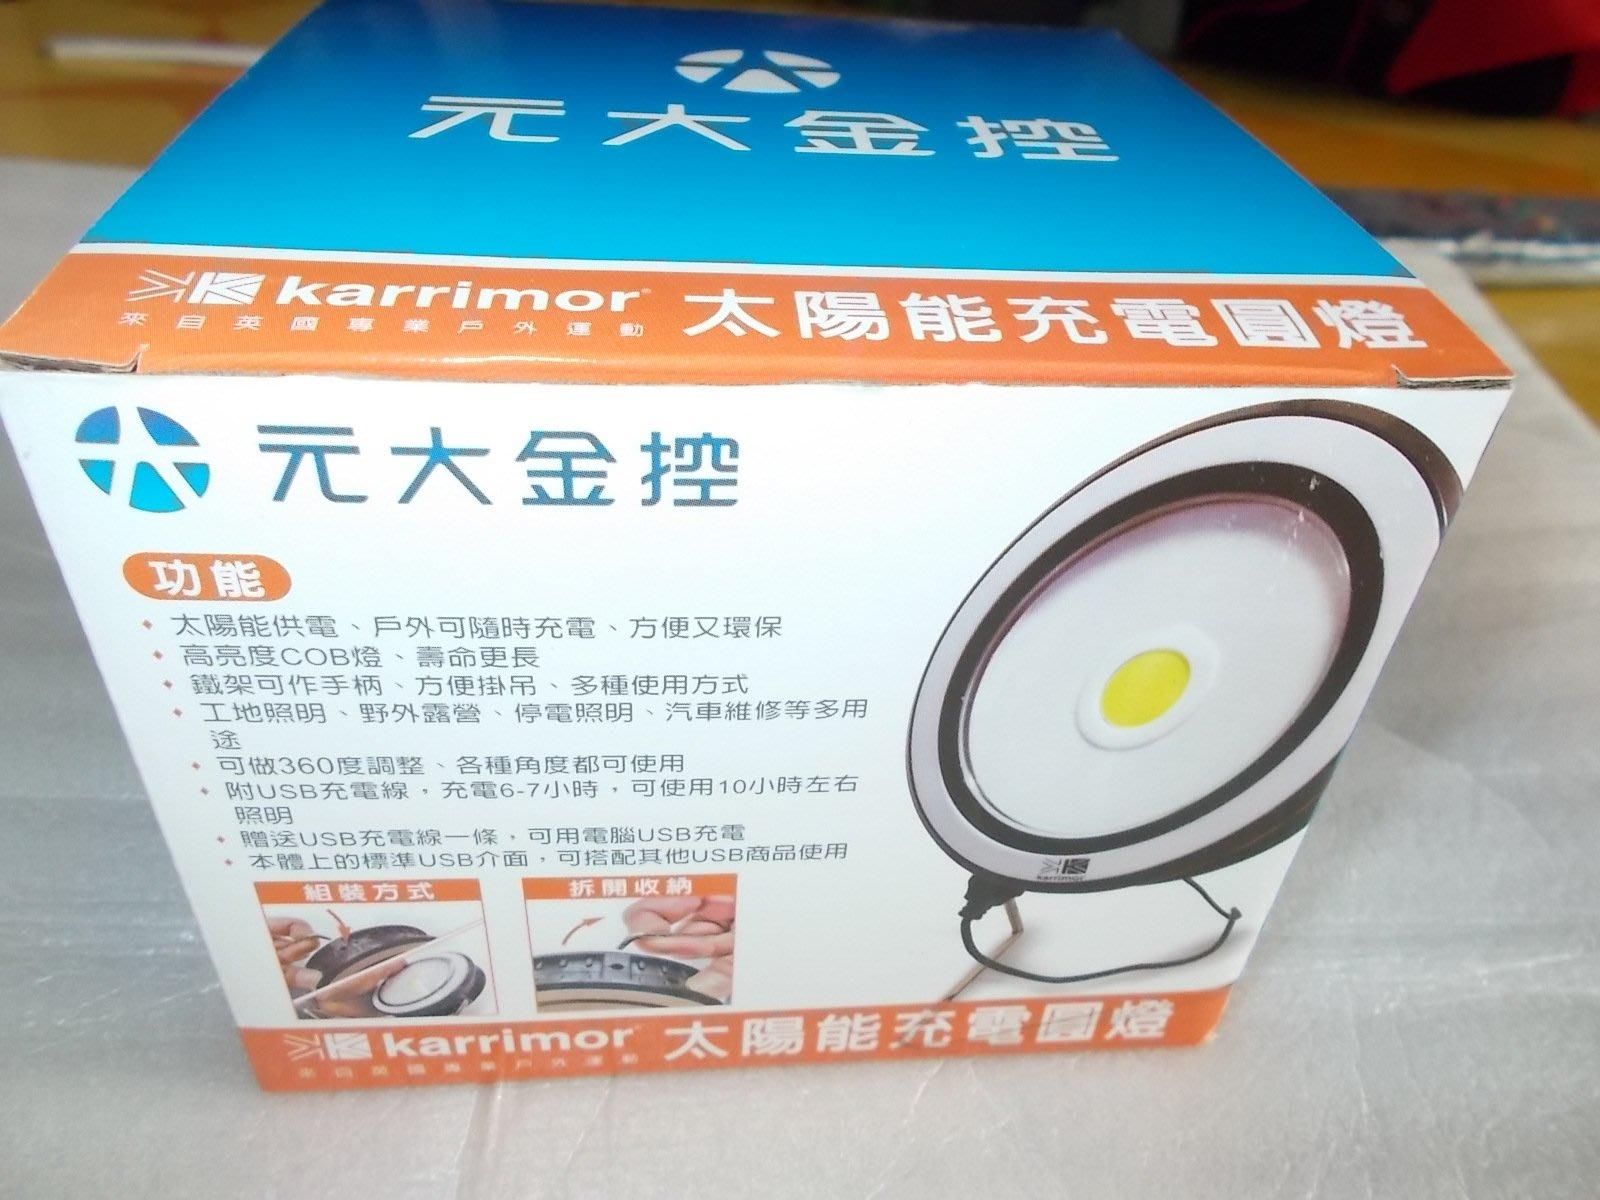 Karrimor 太陽能充電圓燈 露營燈 緊急照明燈 附USB充電線